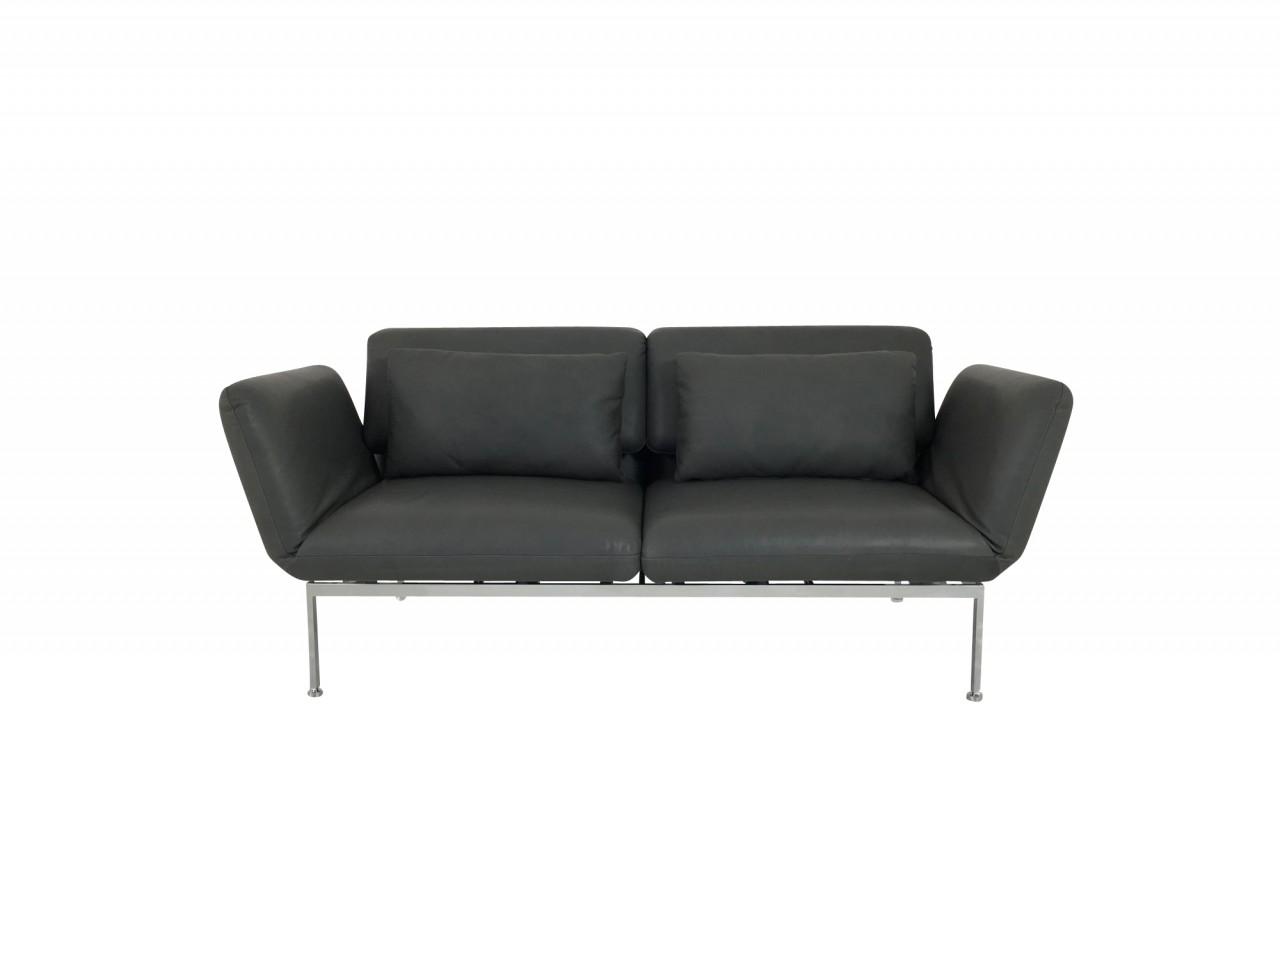 br hl roro medium sofa im anilin leder pearl leder grau mit gestell mattchrom br hl roro. Black Bedroom Furniture Sets. Home Design Ideas